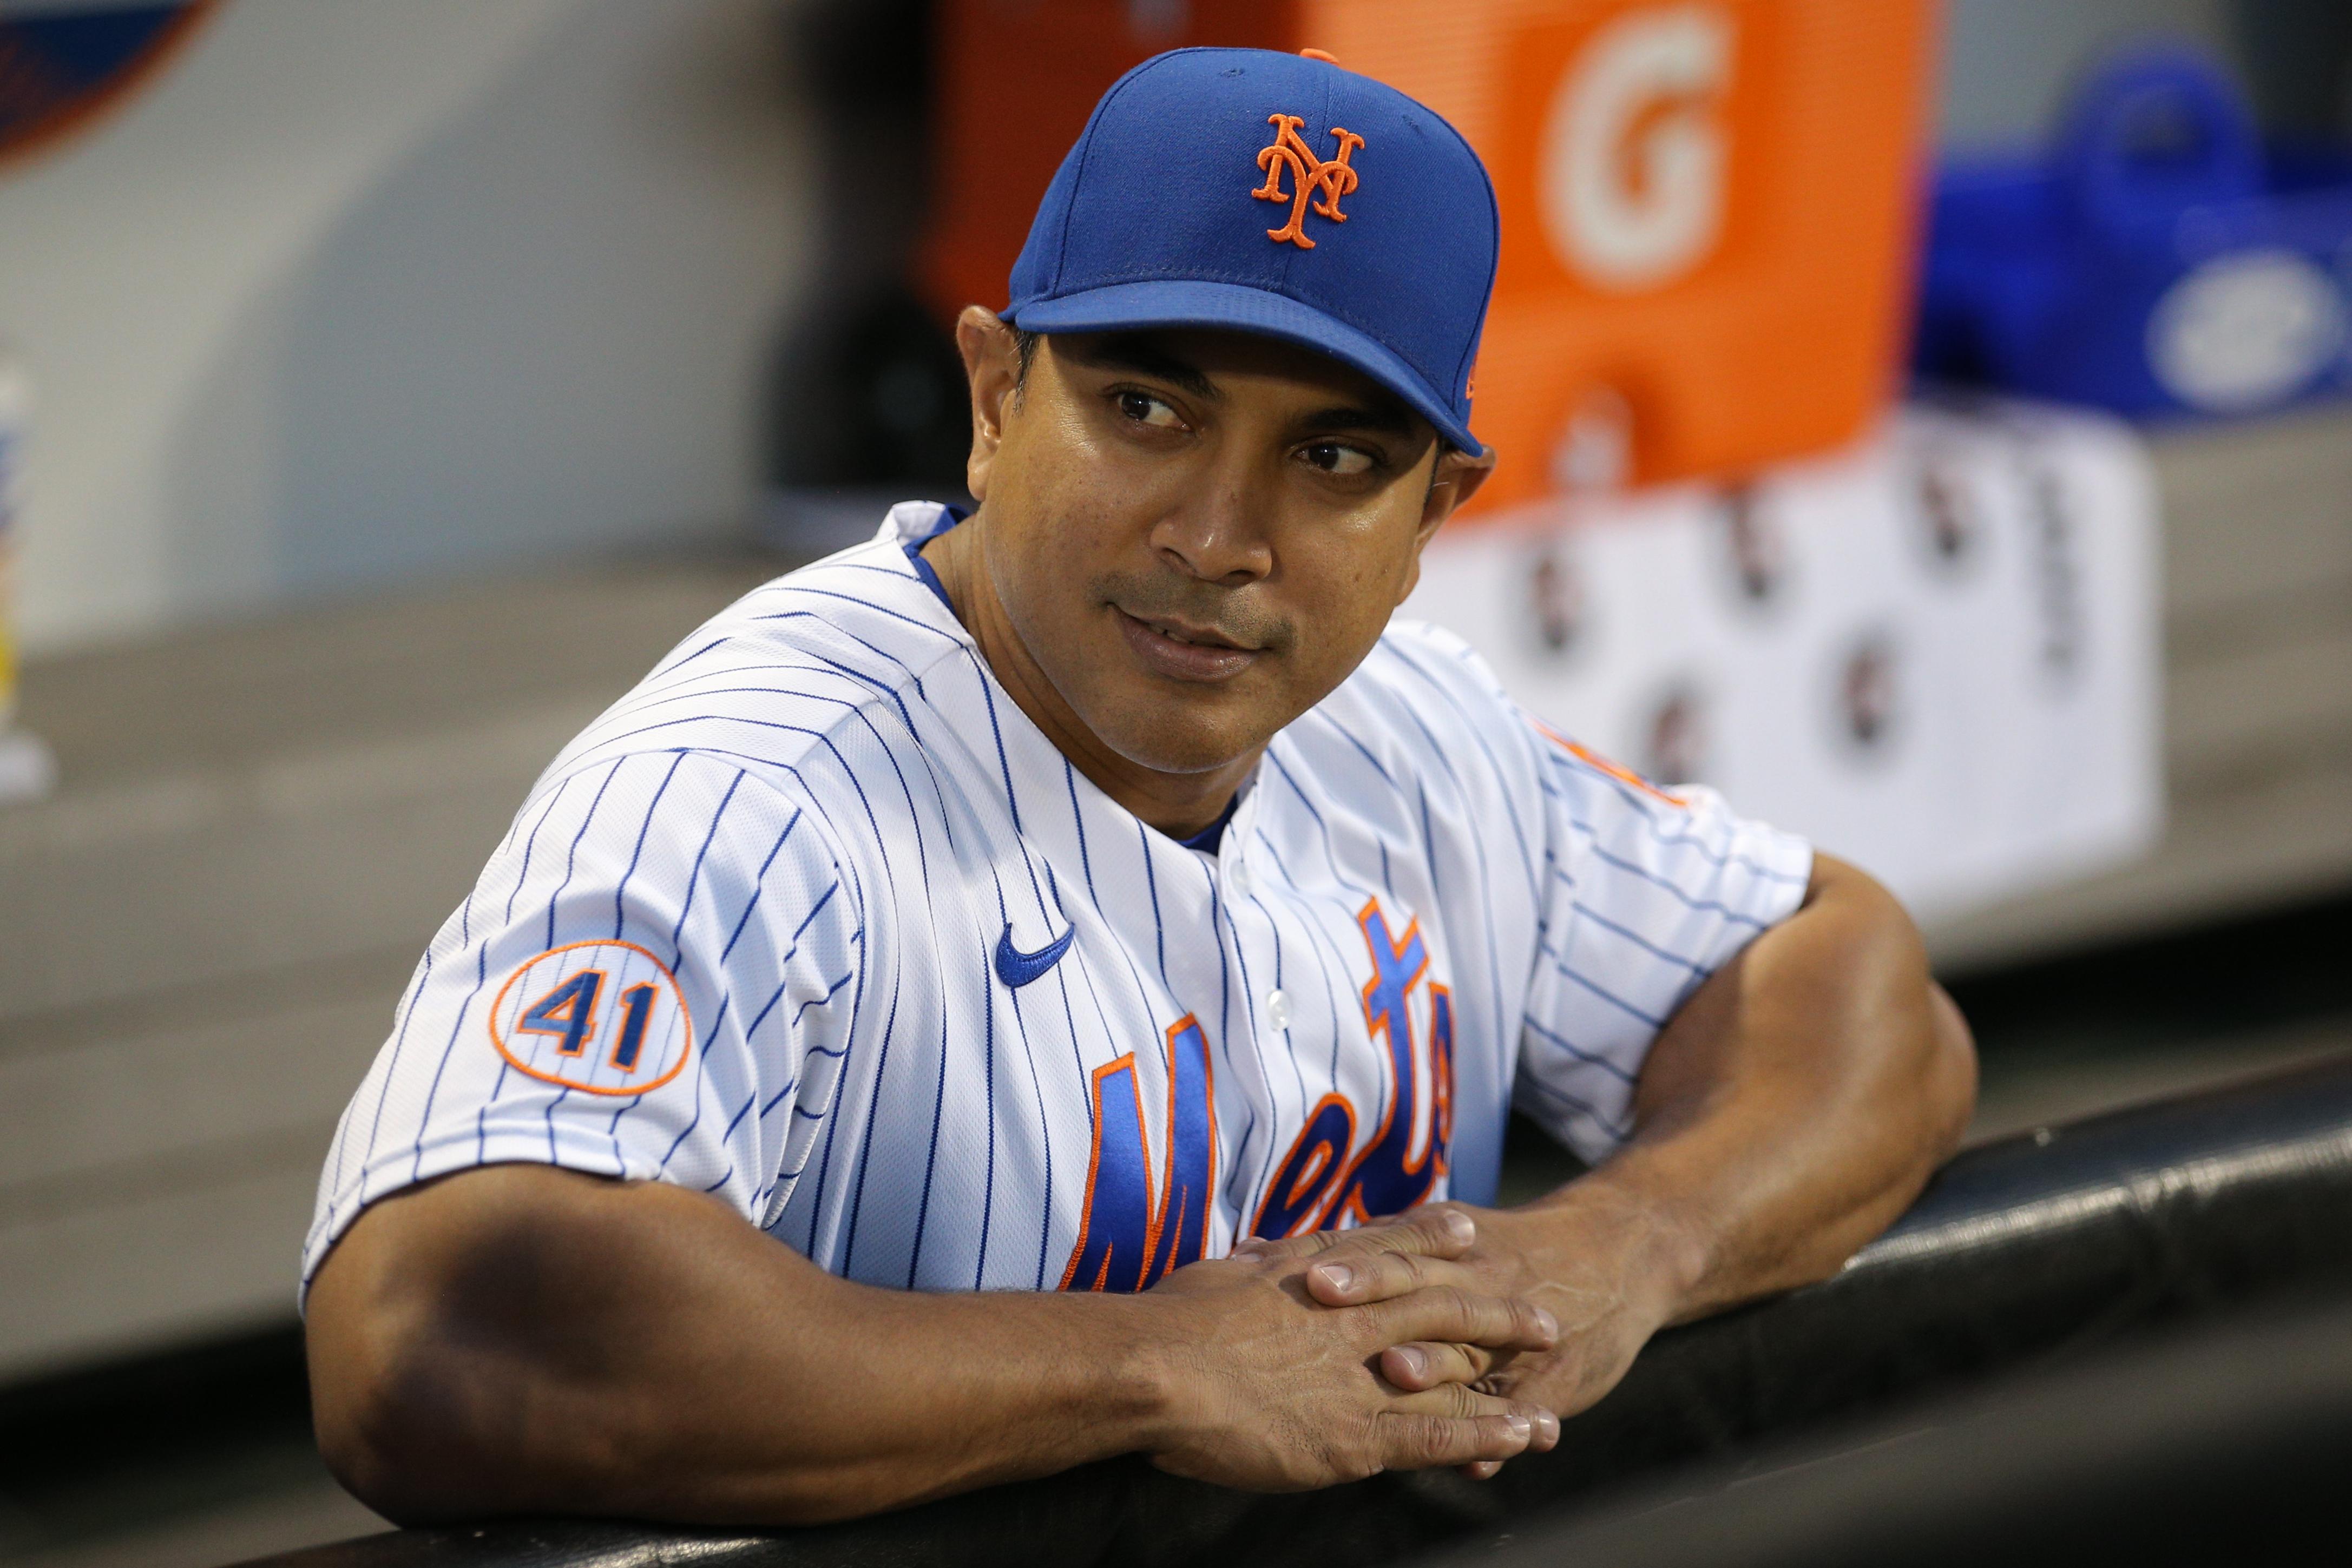 New York Mets decline 2022 option on Luis Rojas